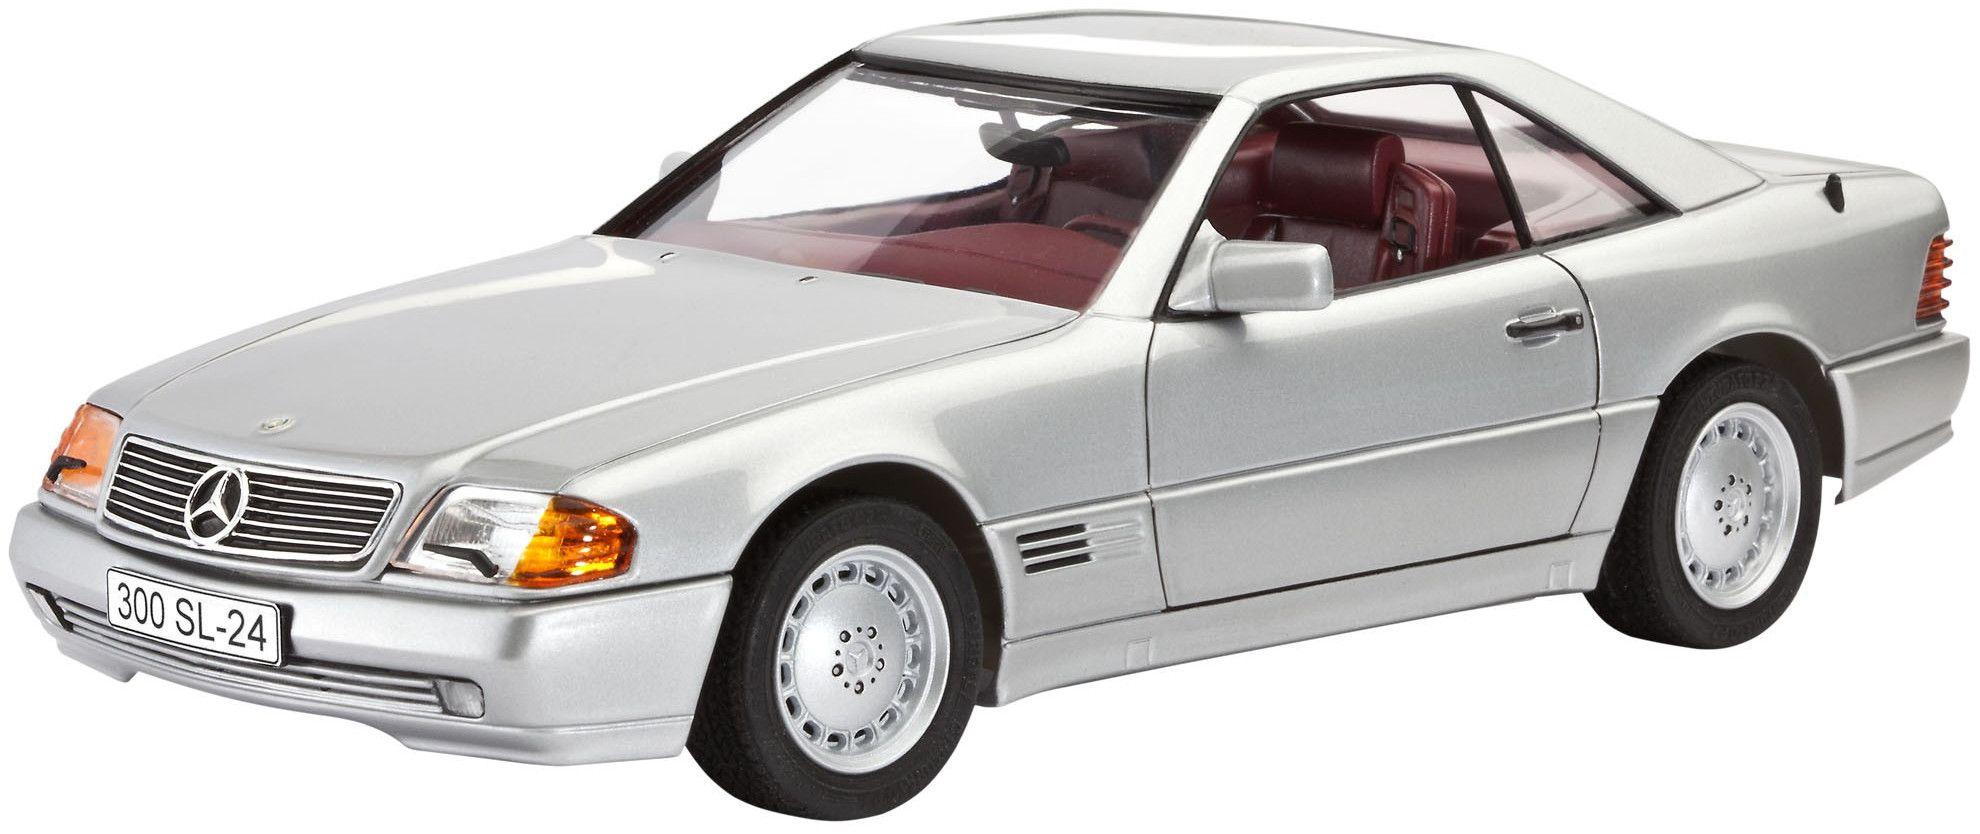 Сглобяем модел на автомобил Revell - Mercedes-Benz 300 SL-24 Coupé (07174) - 1